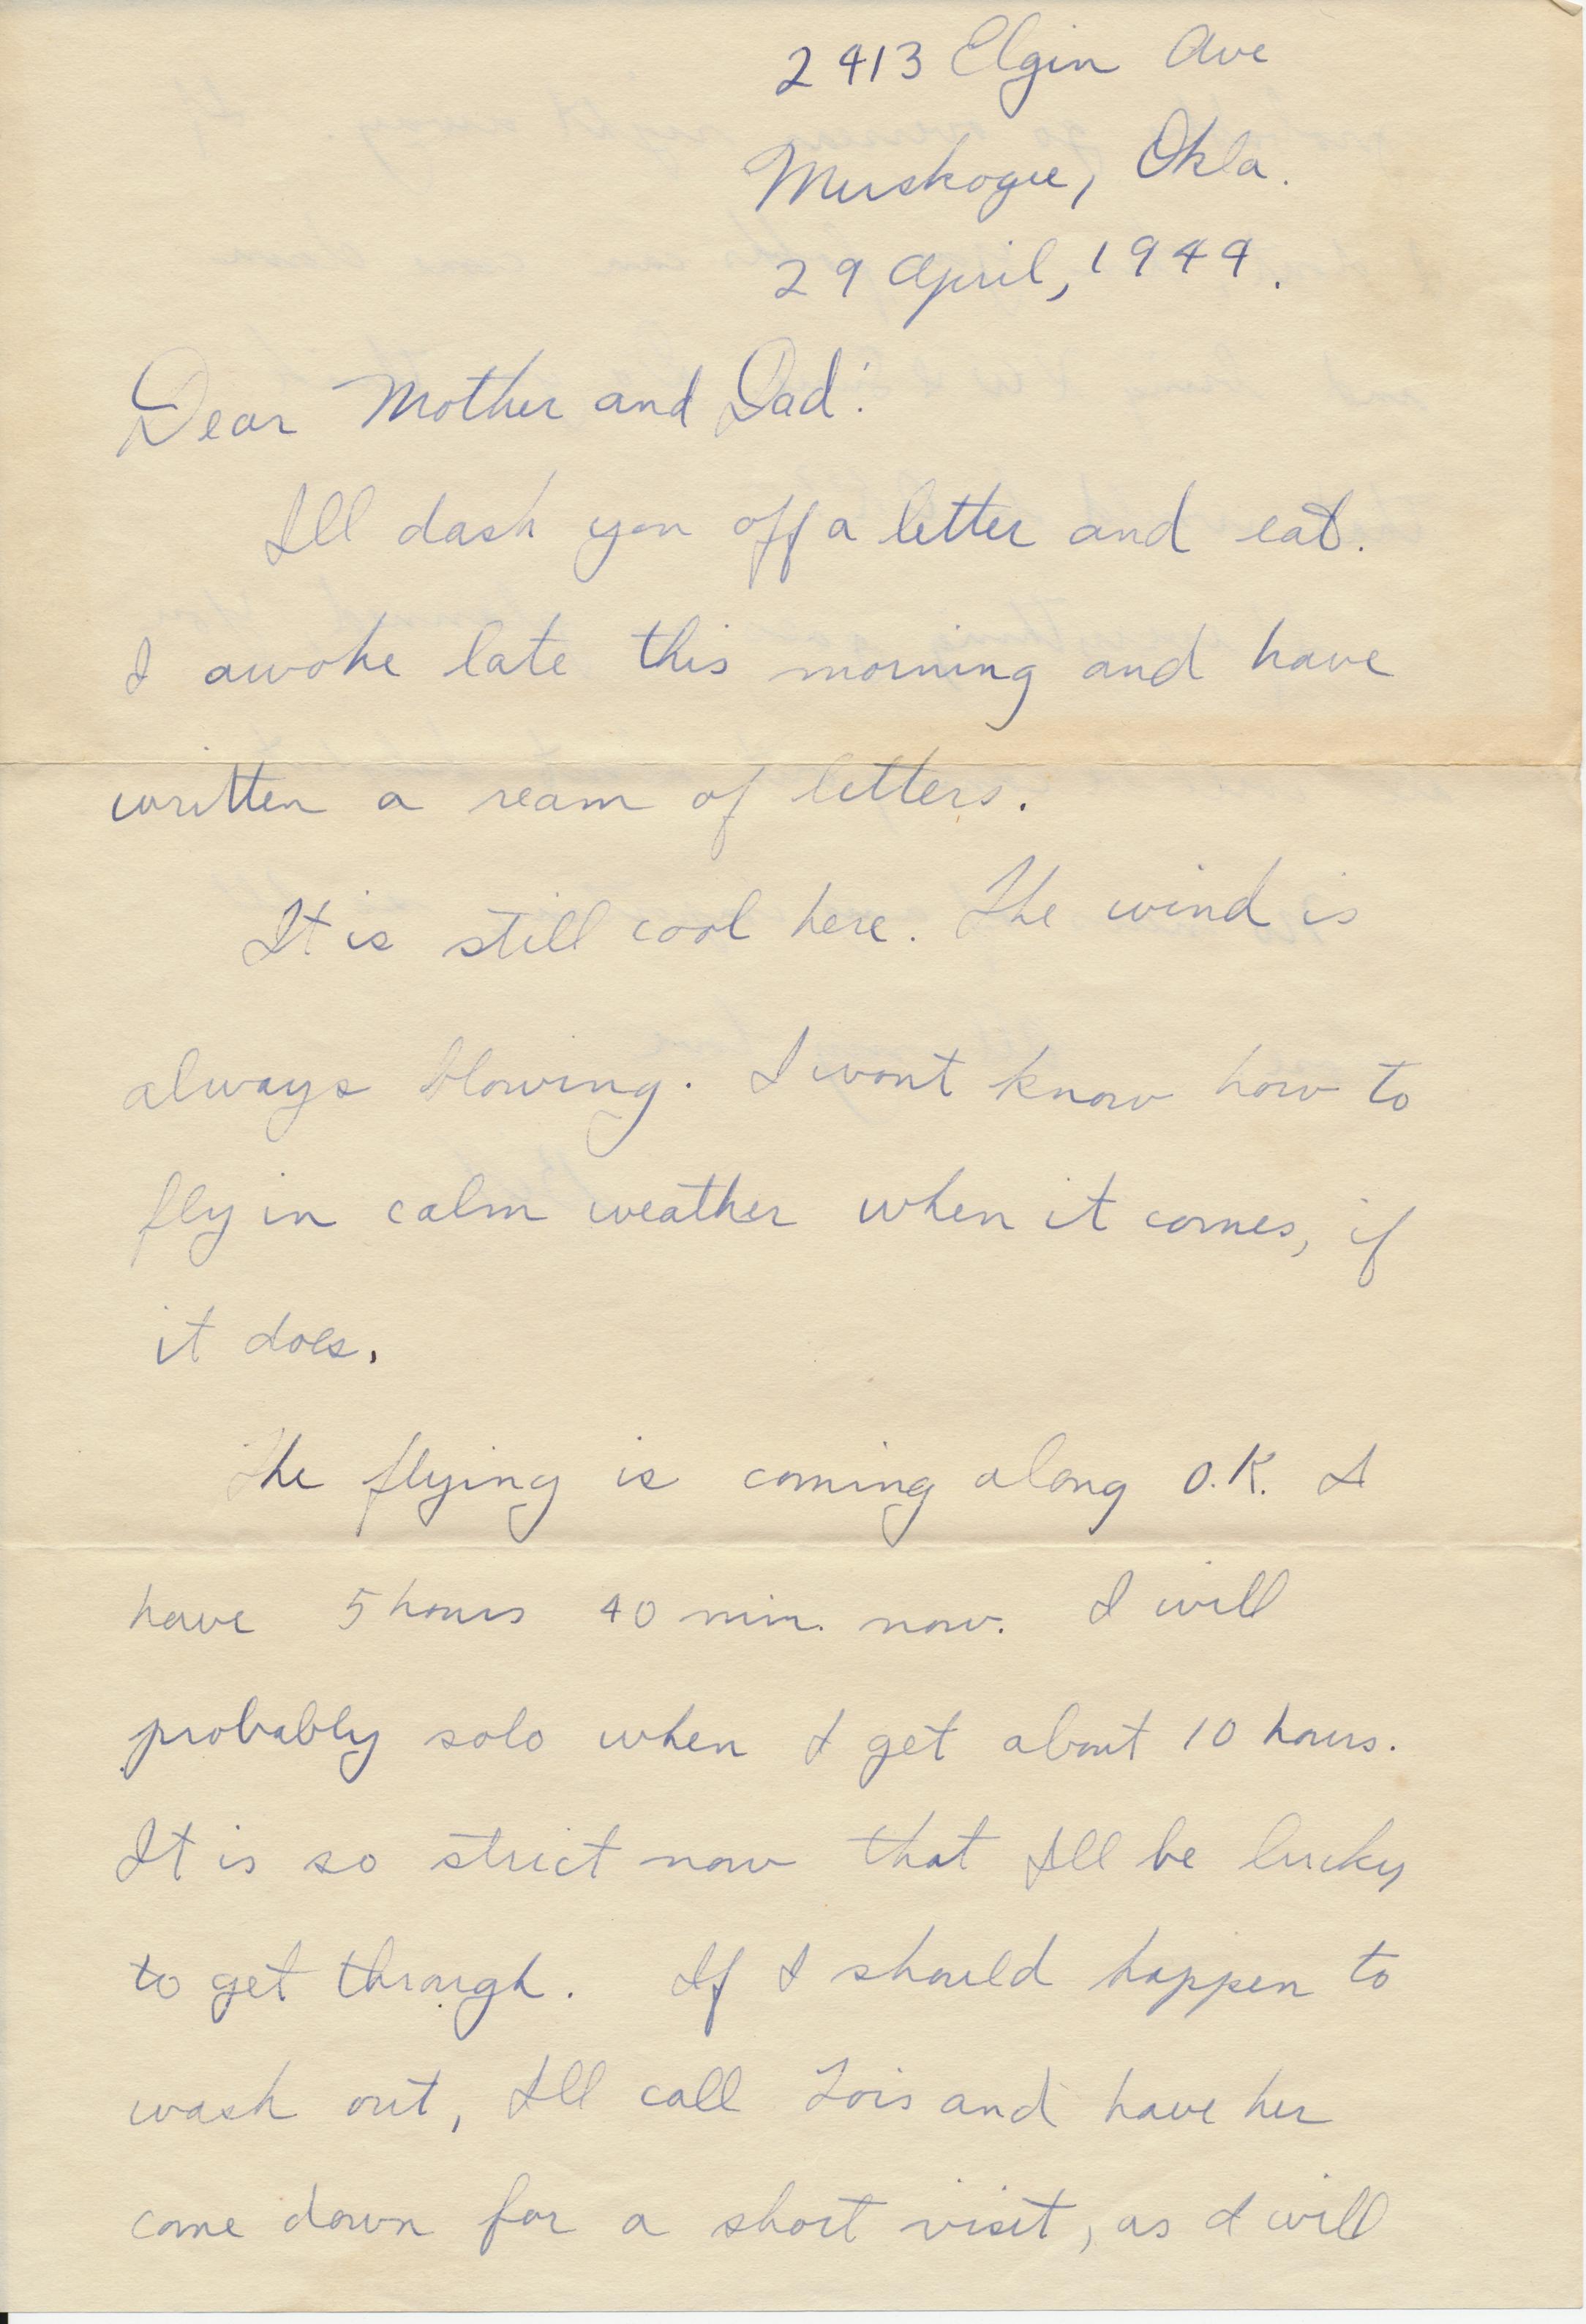 letter_shepardw_to_shepardwr_1944_04_29_p01